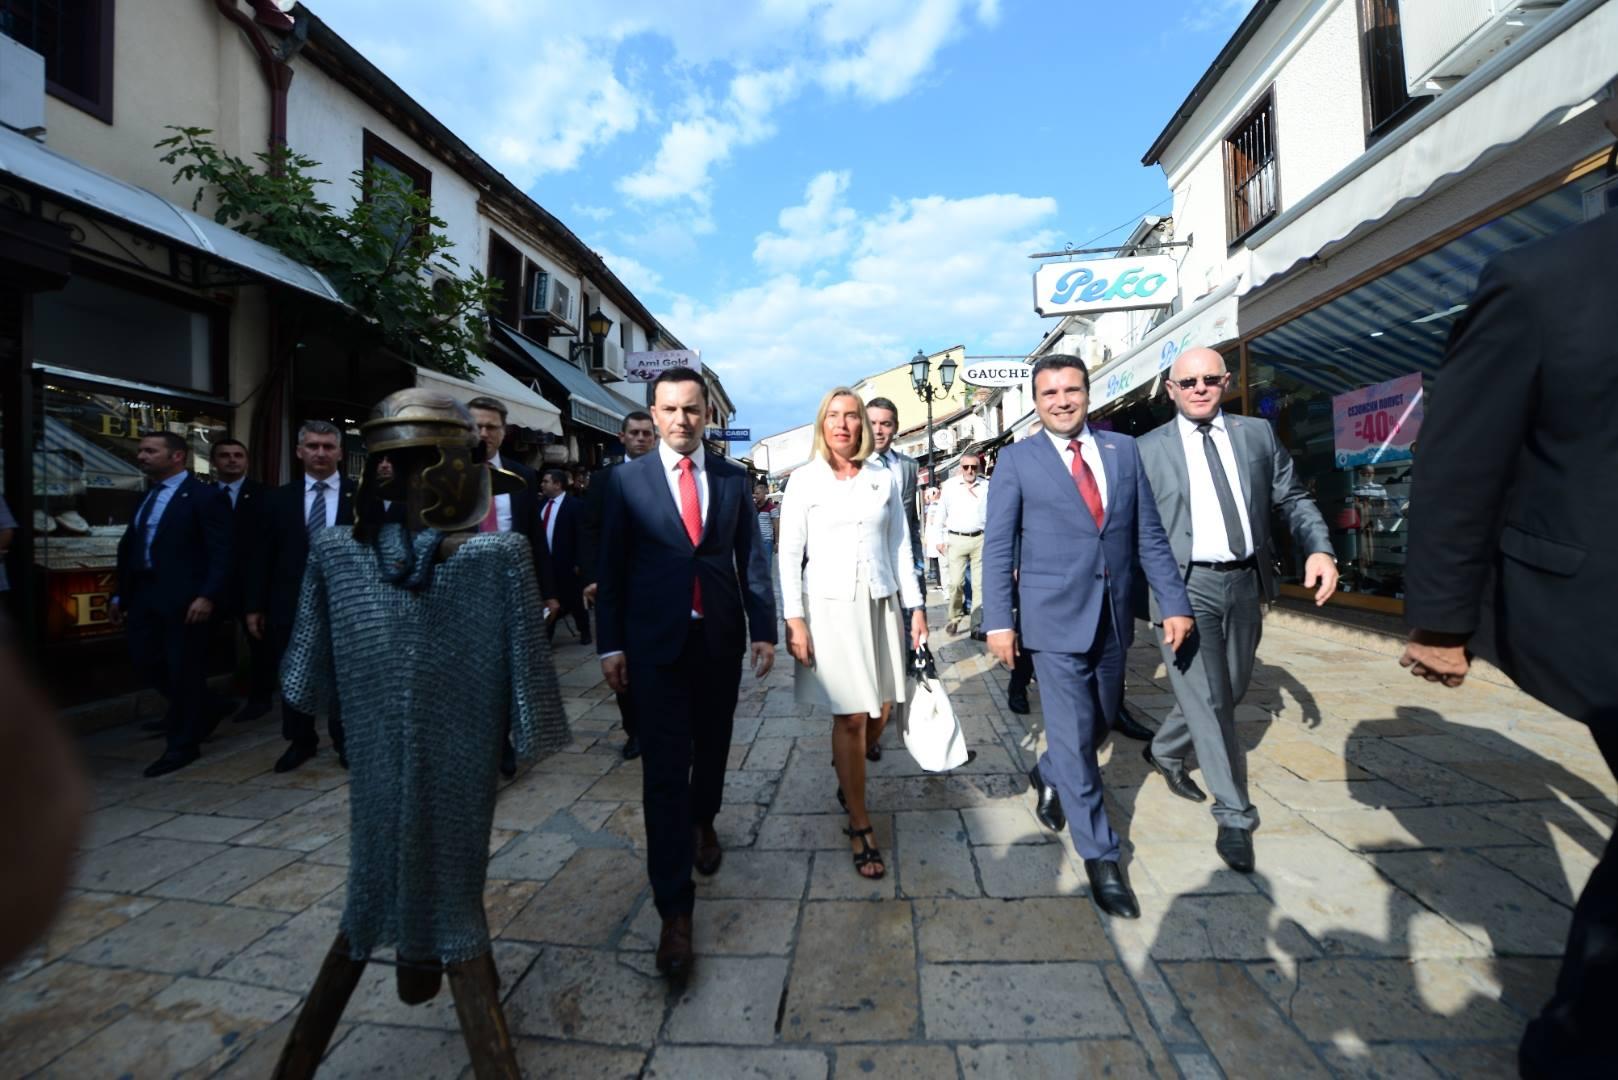 Mogherini in Skopje sends messages of support for the referendum